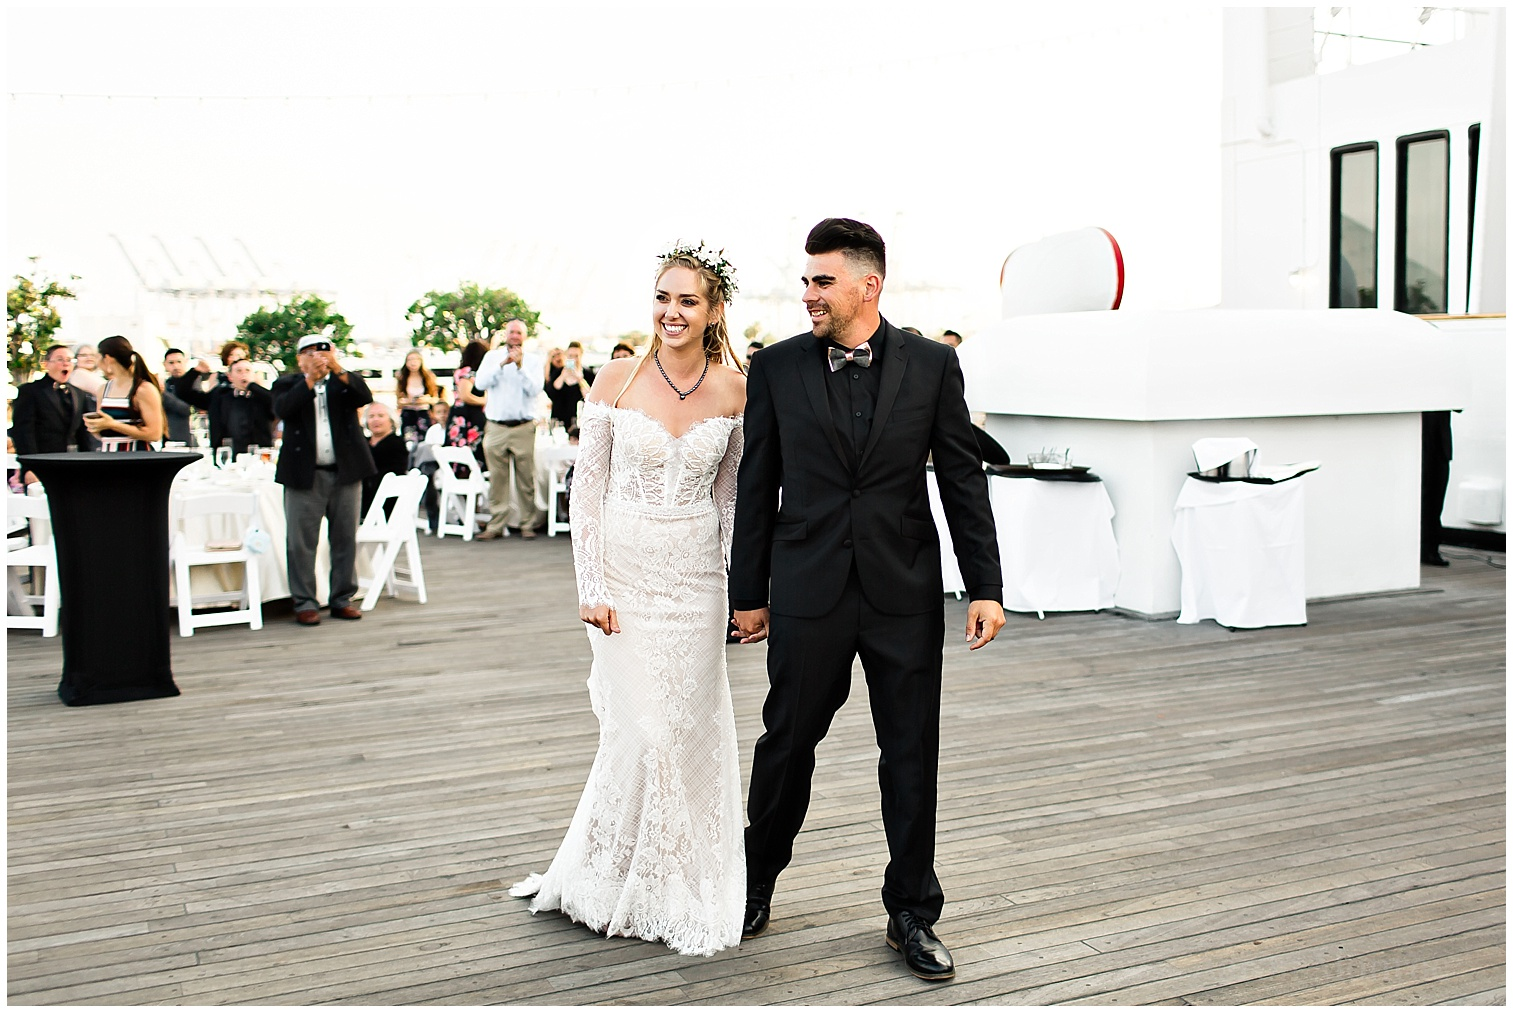 Queen_Mary_Long_Beach_Wedding_Photography_0487.jpg